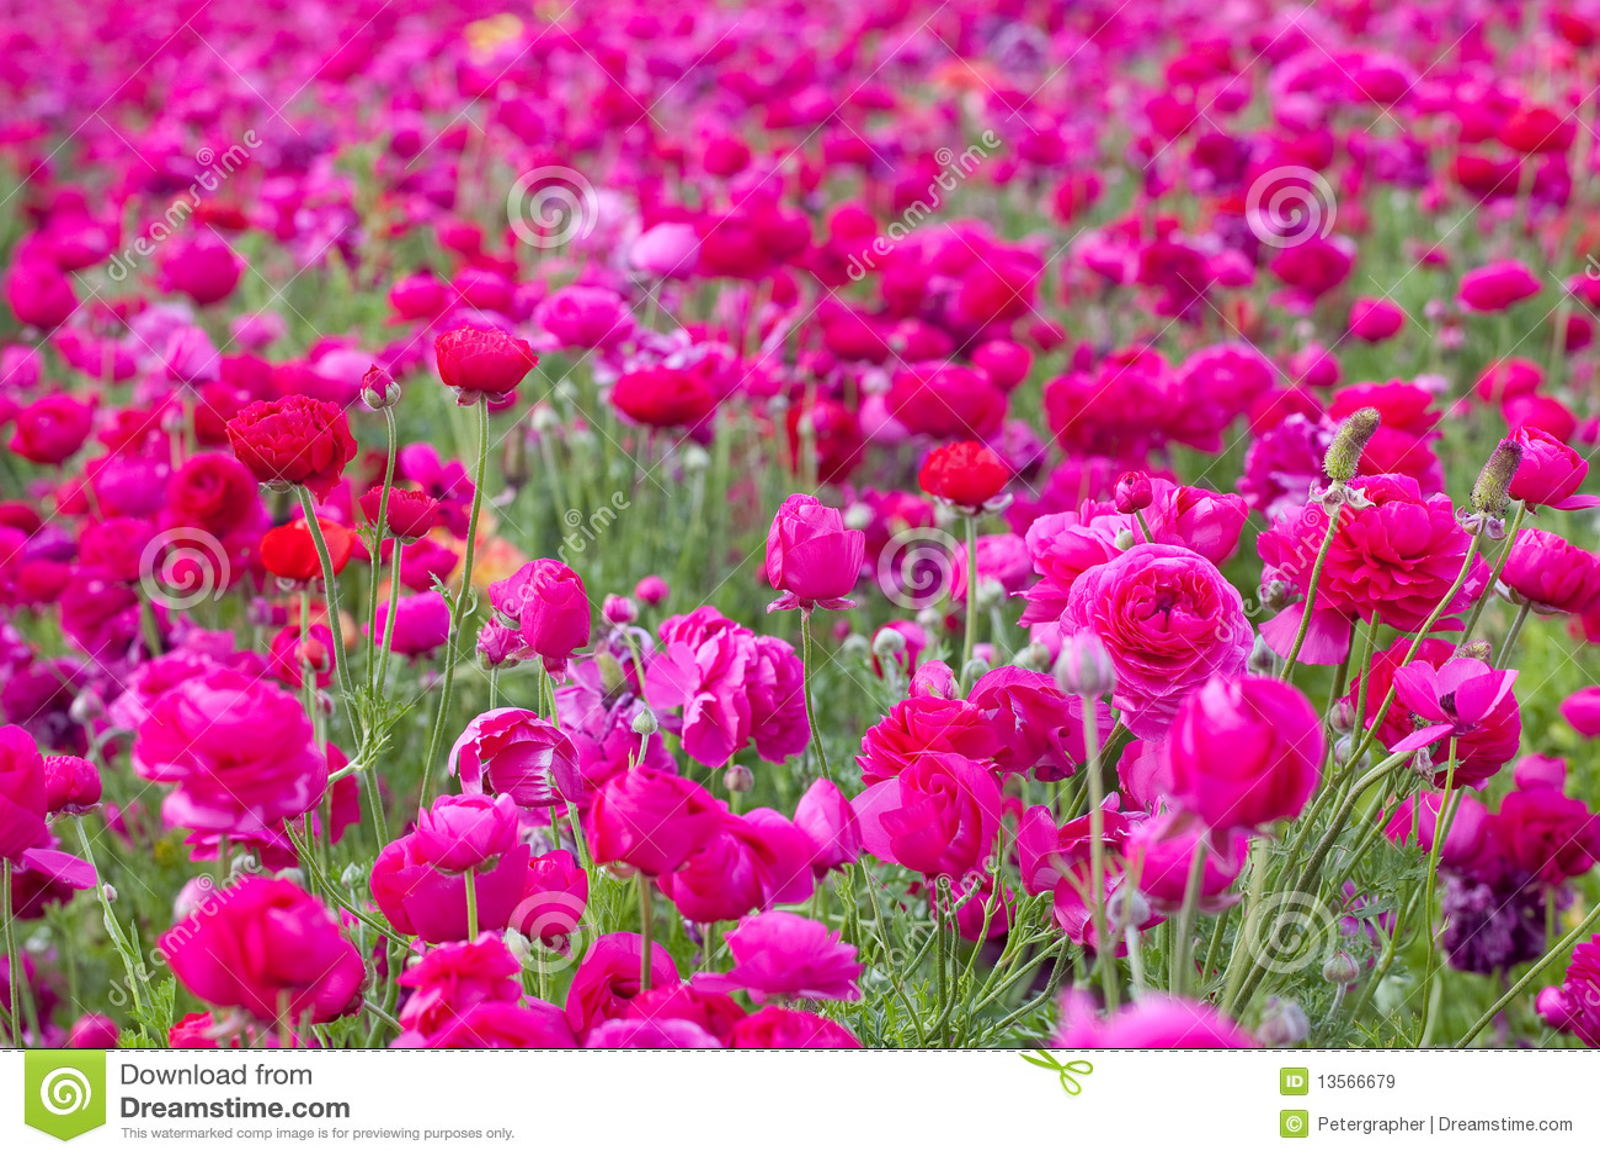 Field Of Pink Flowers Comousar